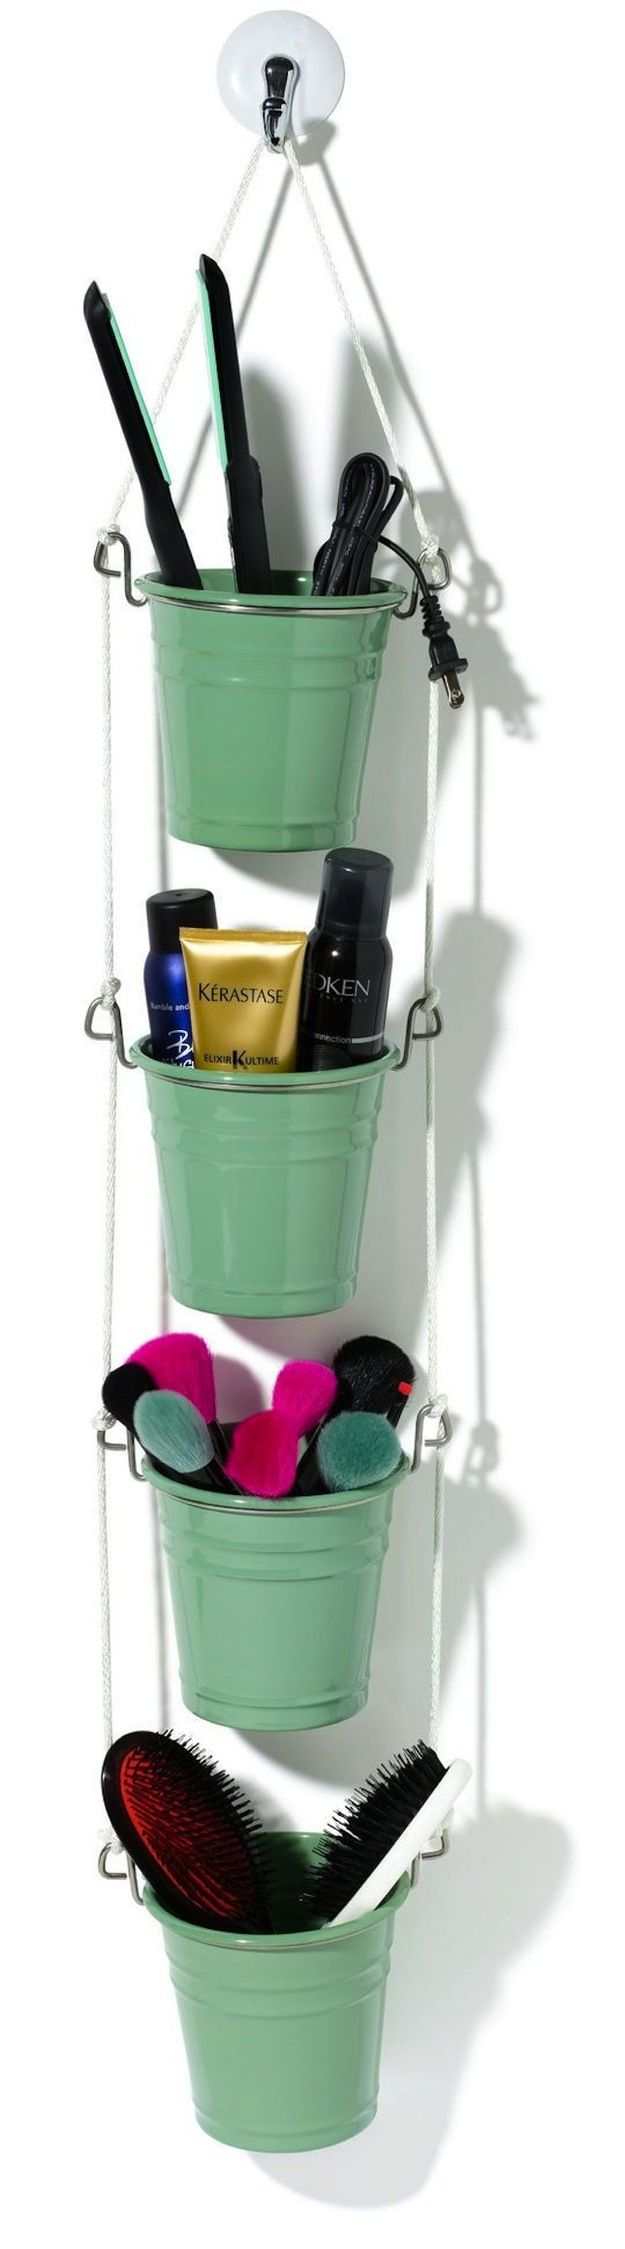 Hanging buckets